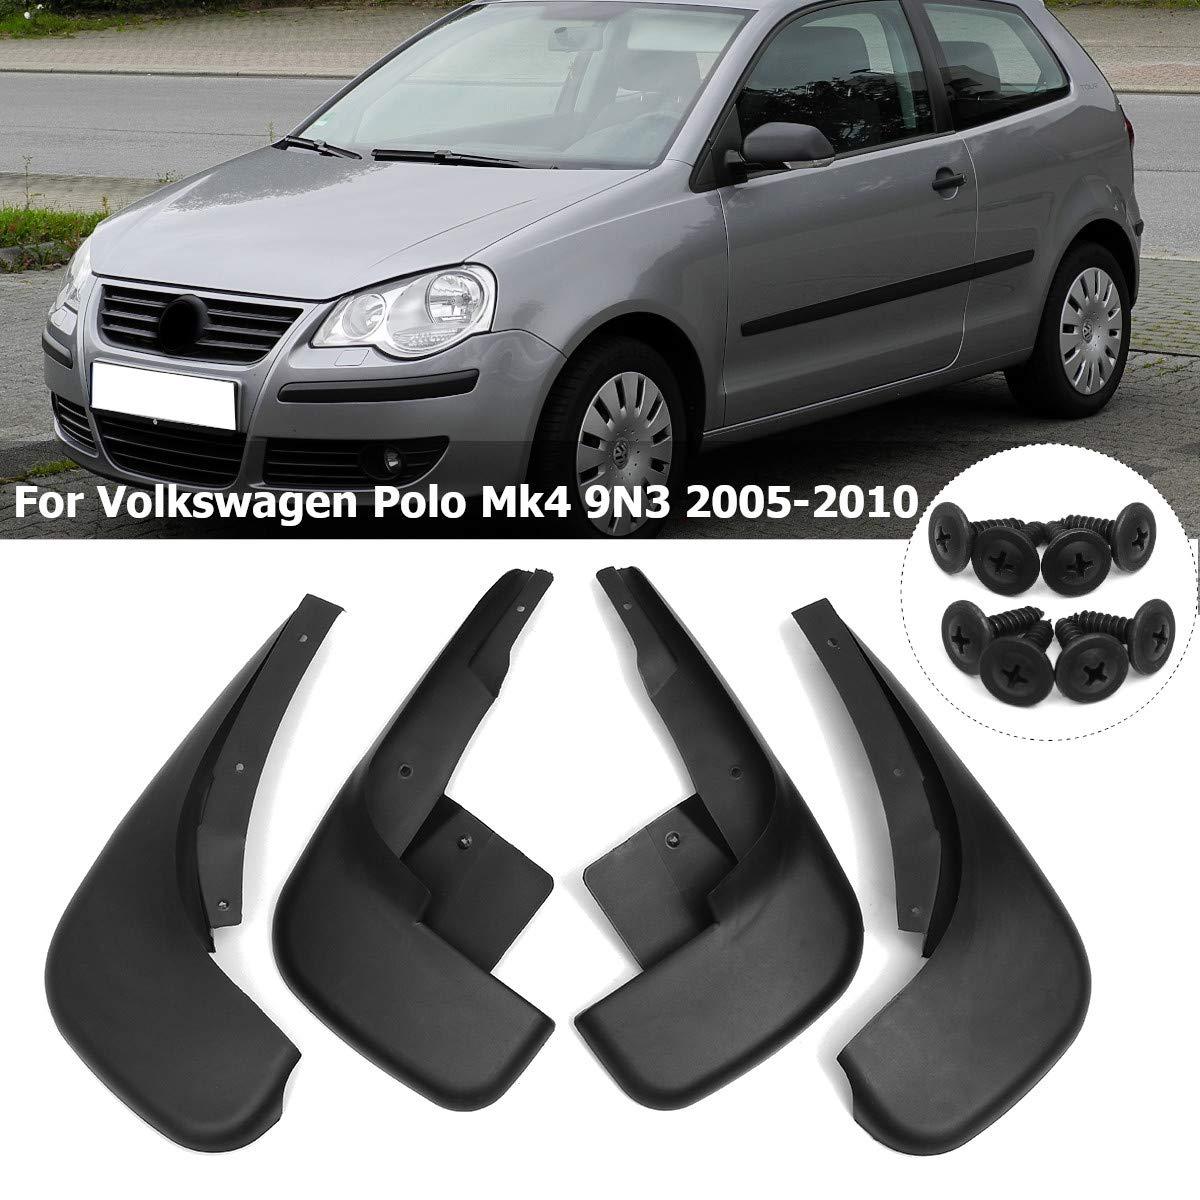 TAYDMEO Guardabarros de Coche,para VW Polo Mk4 9N3 2005-2009, 4 ...